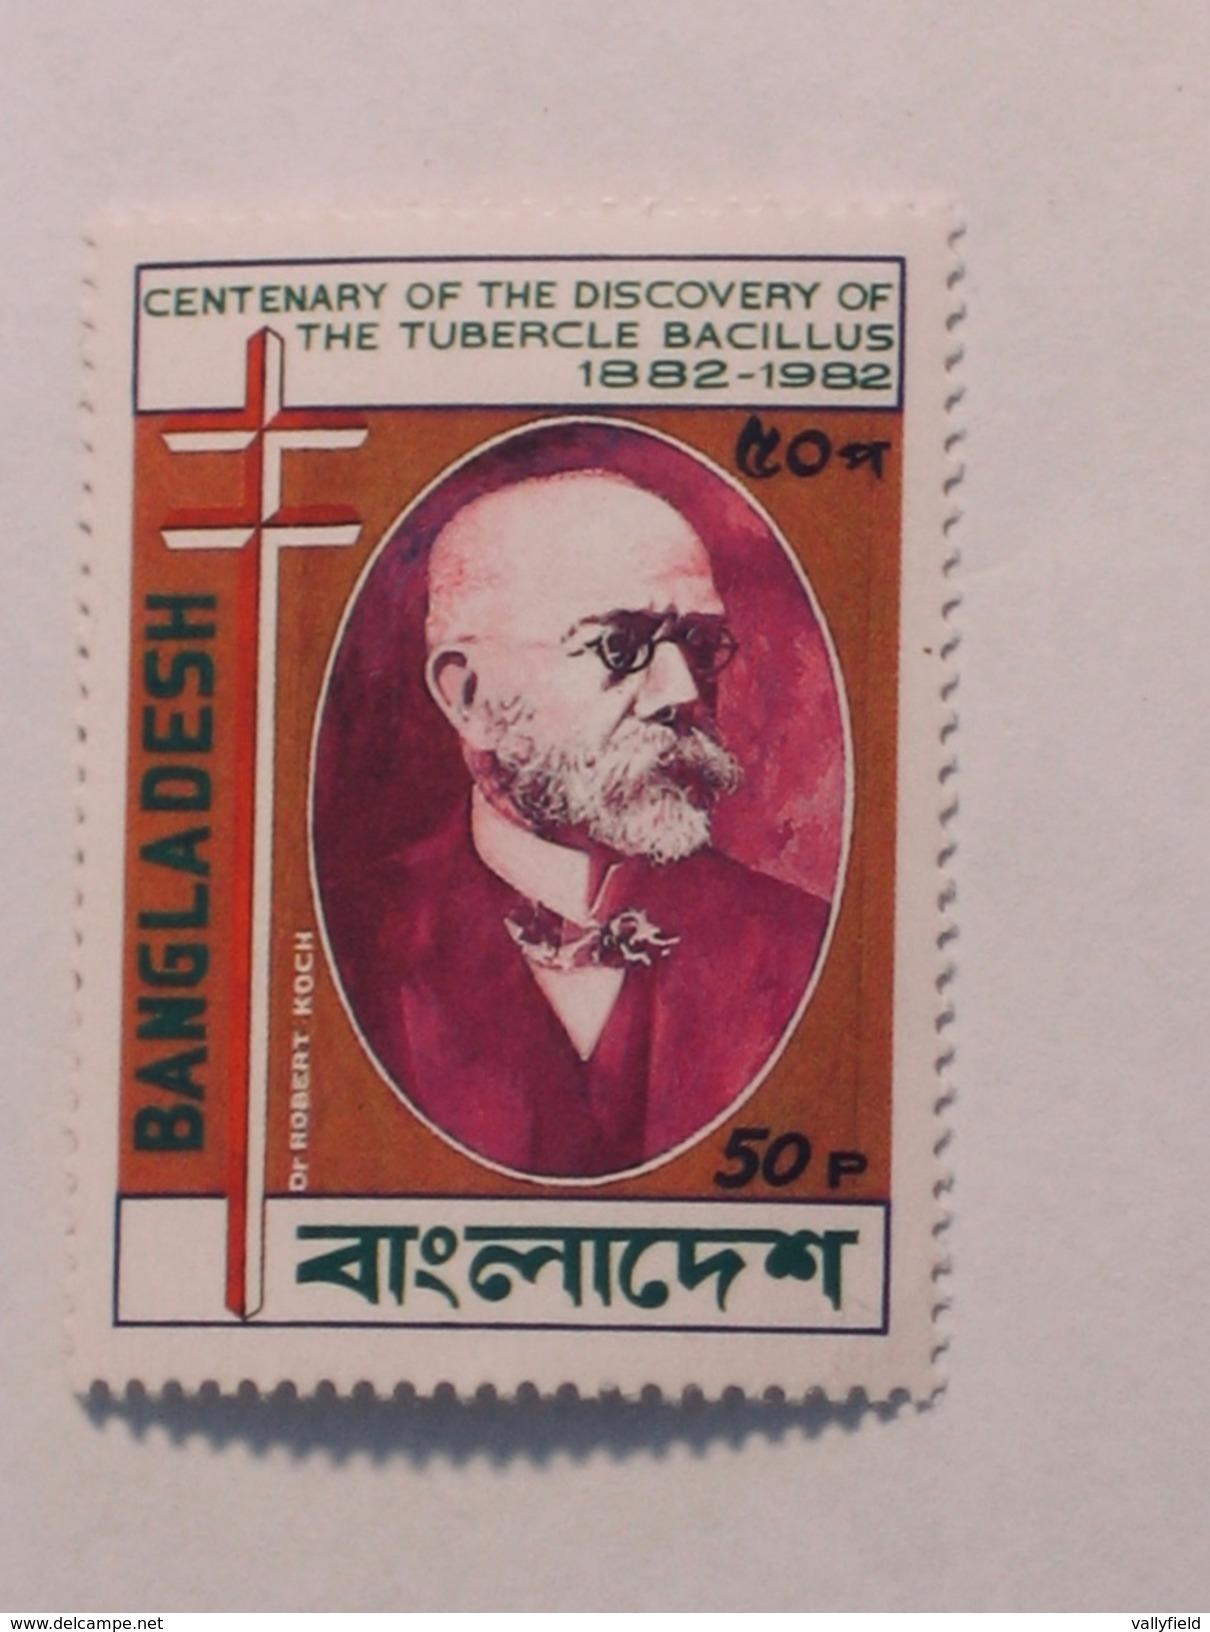 BANGLADESH  1983  Lot # 13  TB BACILLUS CENTENARY - Bangladesh